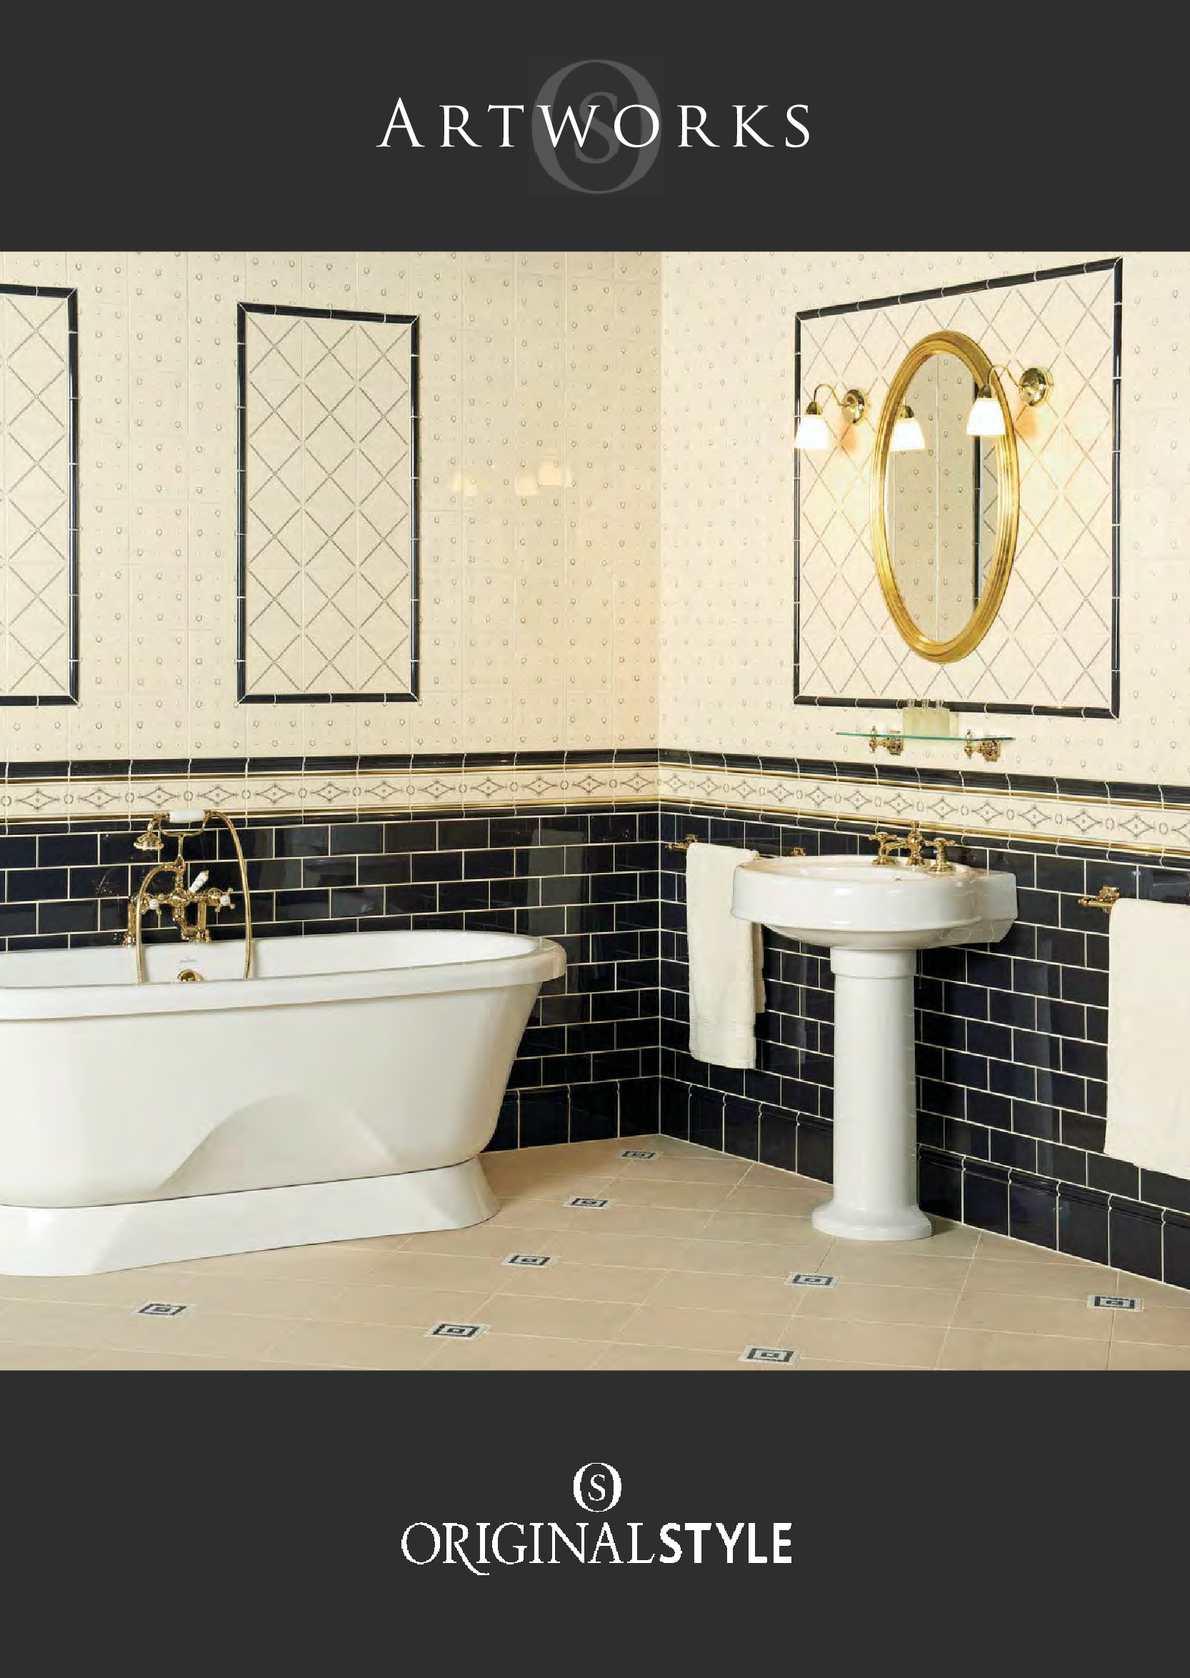 Nettoyage Carrelage Avec Relief calaméo - original style artworks brochure